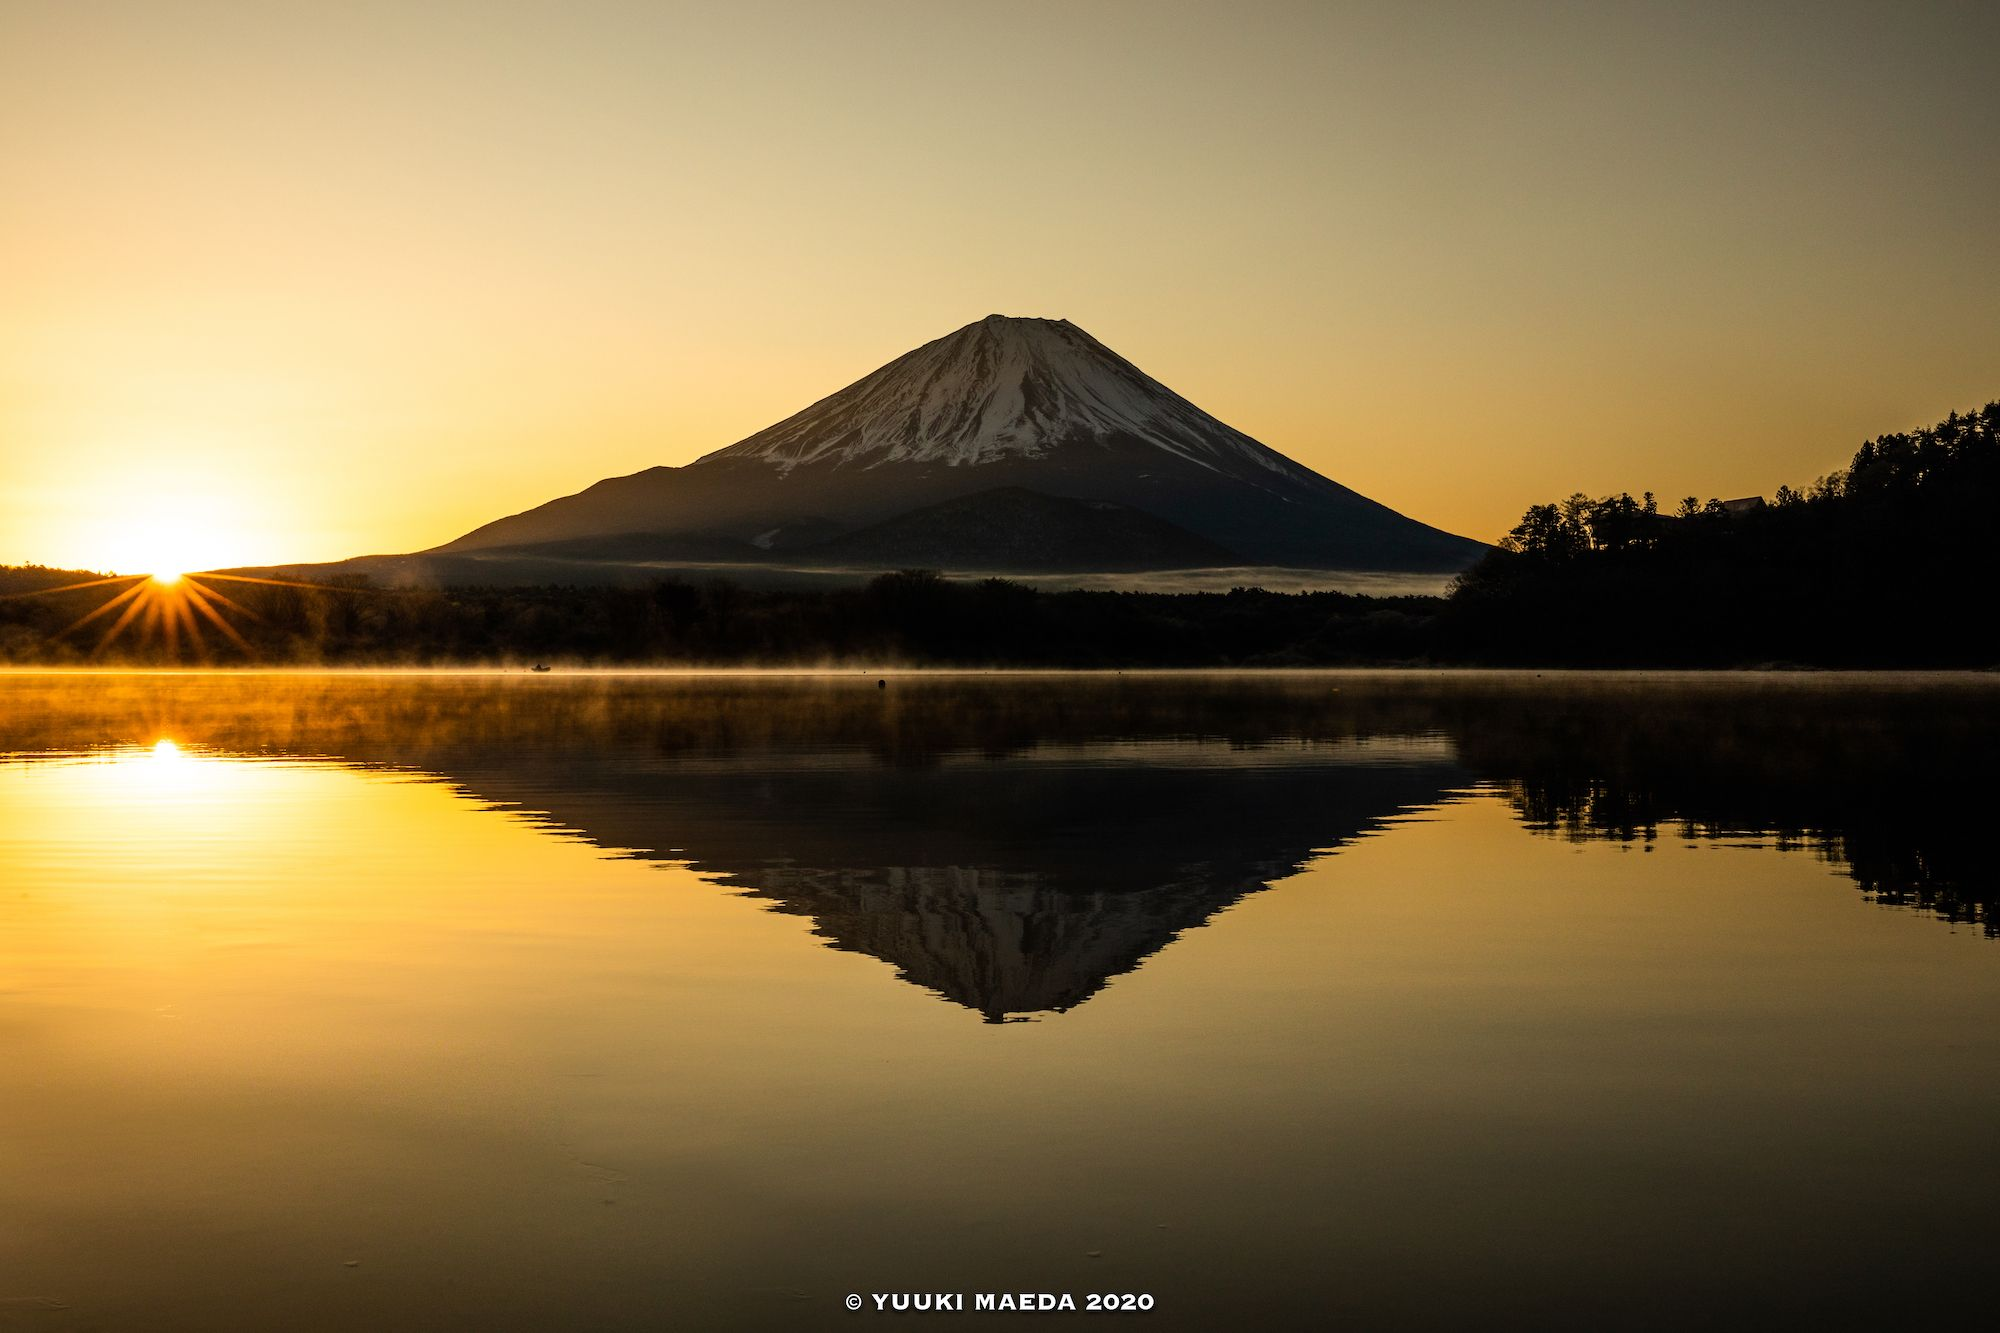 Today is the day of Mt. Fuji! . Photo by : Yuuki Maeda . Follow us for amazing posts! #PASHADELIC #FUJIdelic . . #canon_photos #5dmarkiv #mtfuji #fujiyama #fujisan #photography #photooftheday #nature #naturephotography #landscape #landscapephotography #japan #japan_of_insta #japanphoto #igers #ig_japan #mountain #mountains #mountainphotography #富士山 #富士 #山